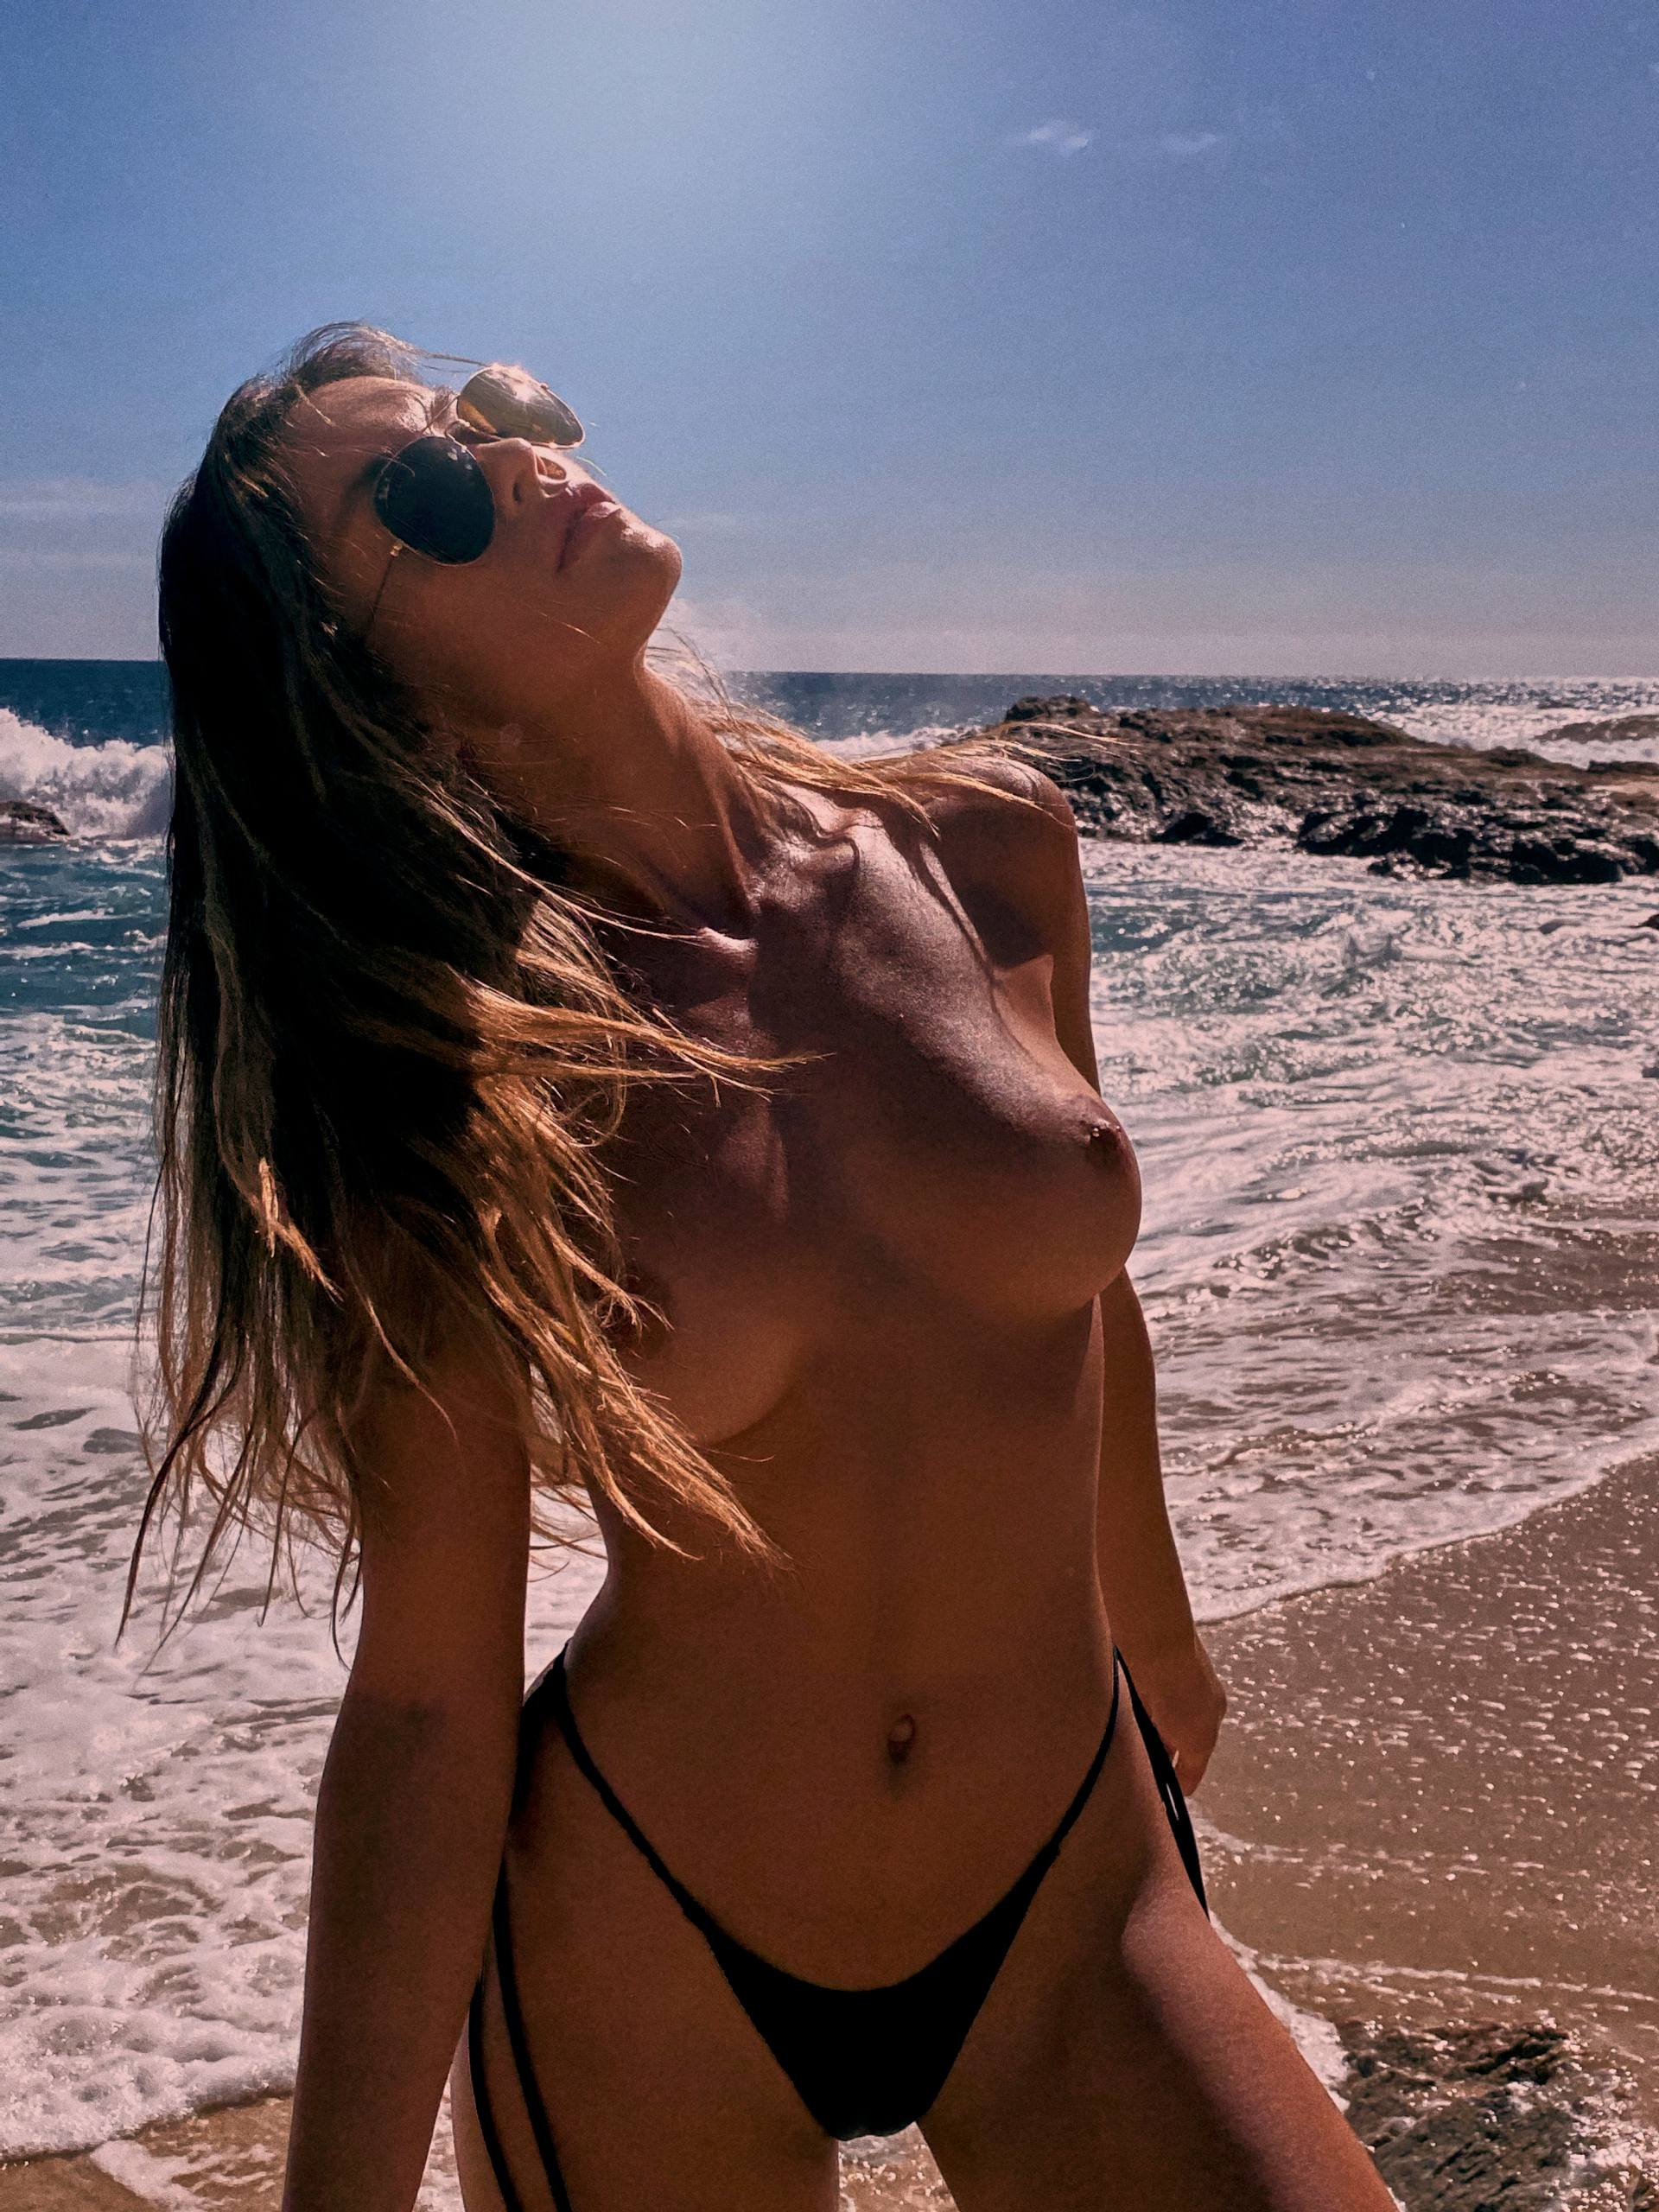 Cherokee Luker – Sexy Boobs In Beautiful Topless Photoshoot By Josh Ryan (nsfw) 0013